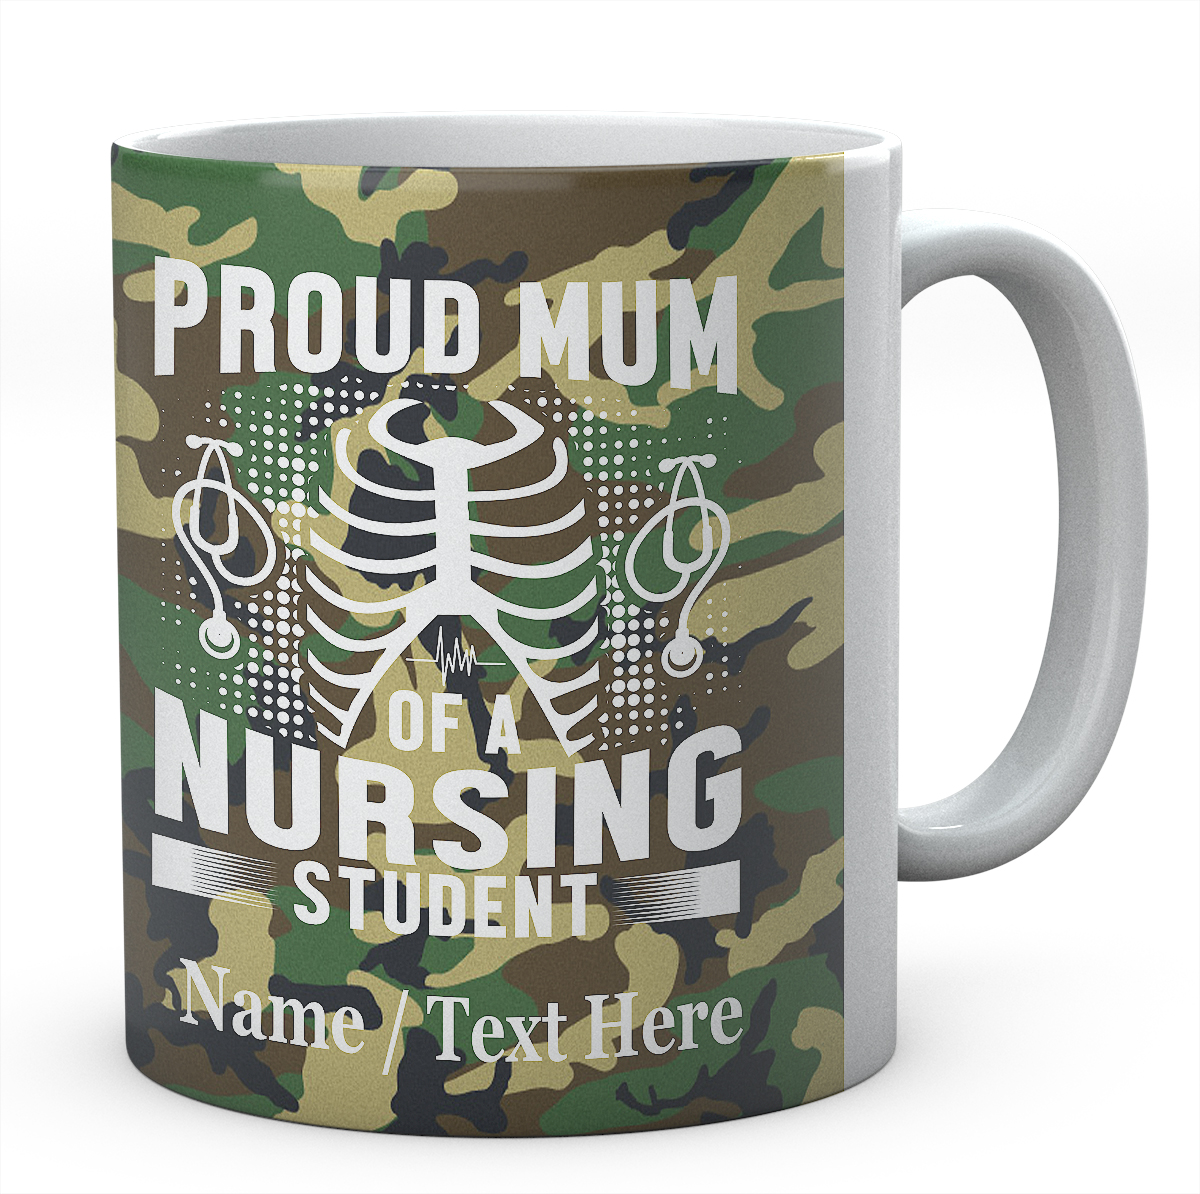 Proud Mum of A Nursing Student -Personalised Name Mug